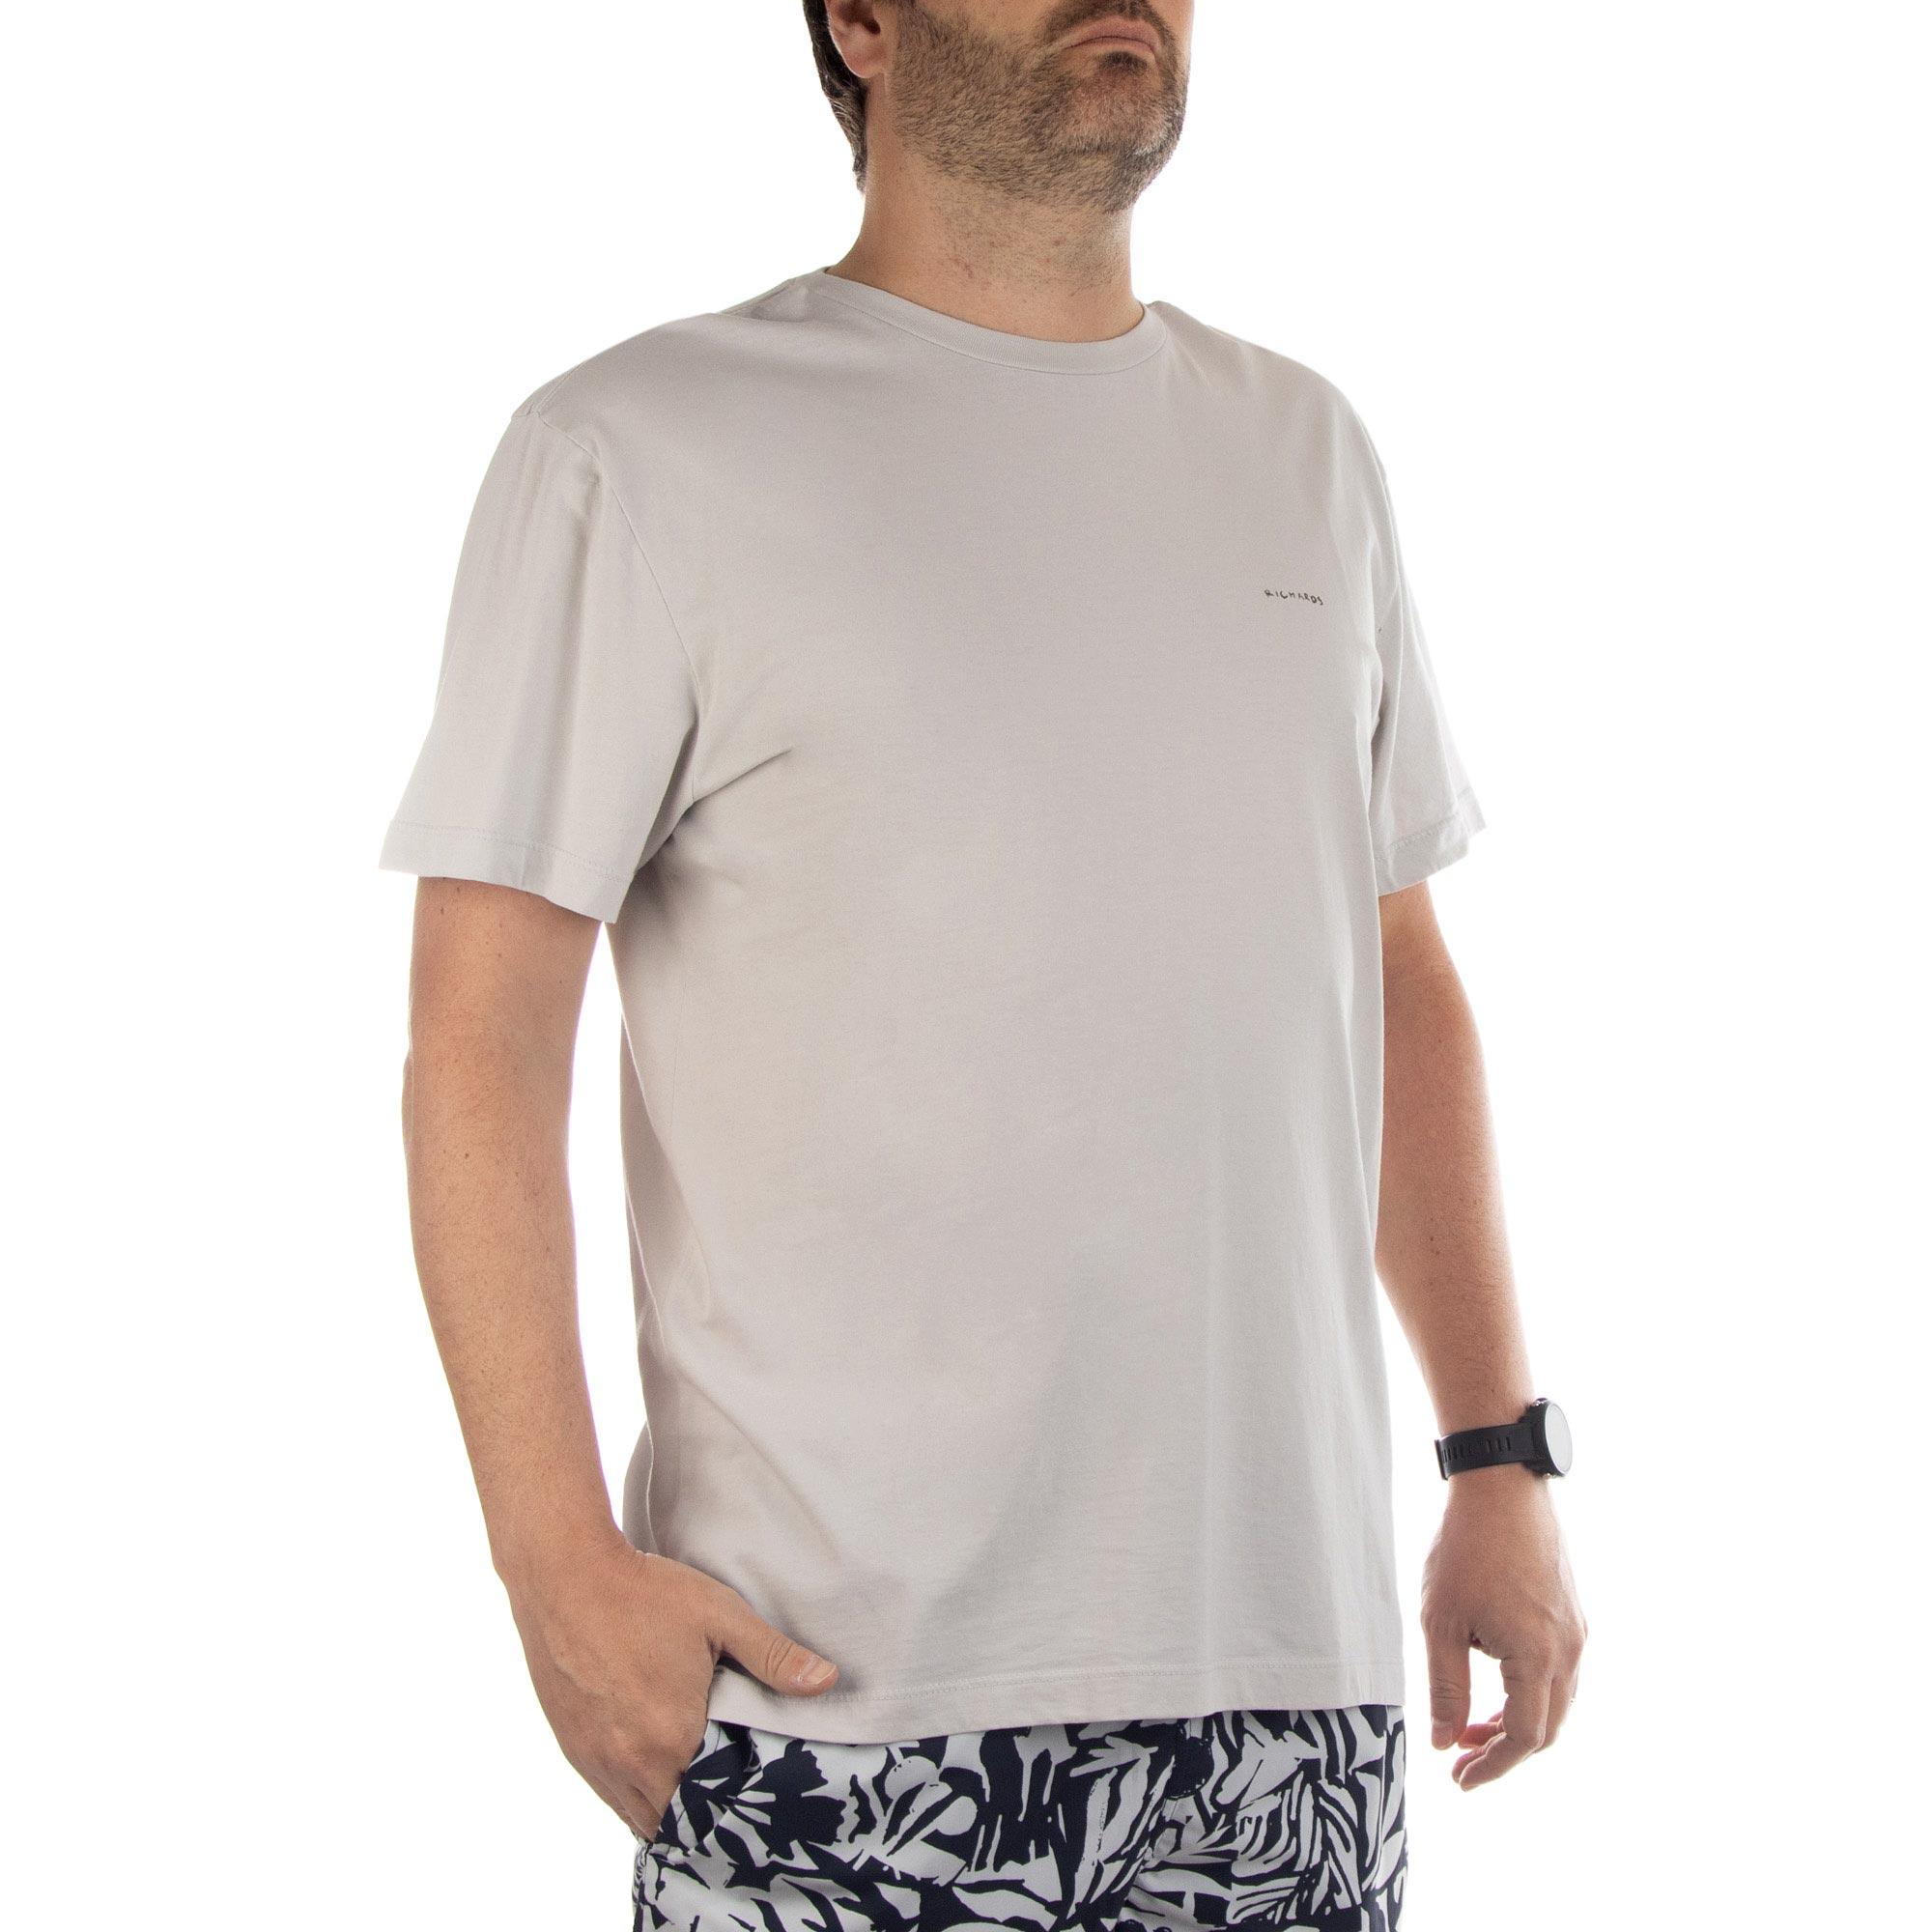 Richards Camiseta Manga Curta Masculino Areia